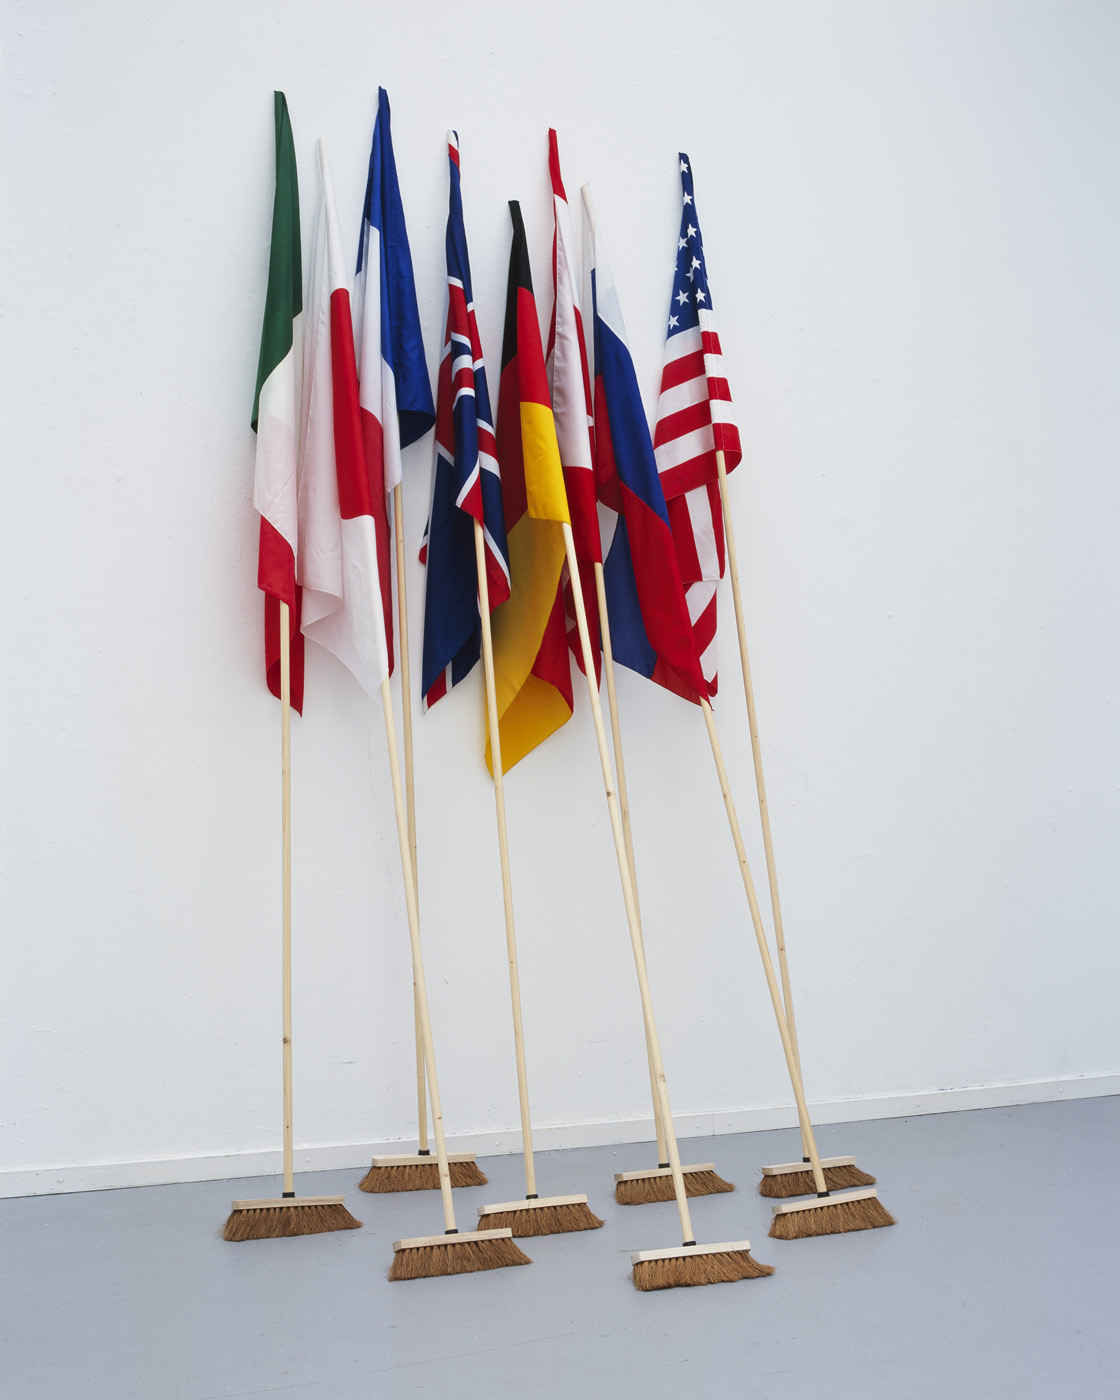 Mounir Fatmi   G8-The Brooms (Contamination) , 2008 12 wood sticks 3 meters high, 8 national flags, 4 black flags (150 x 100 cm each) dimensionsvariable